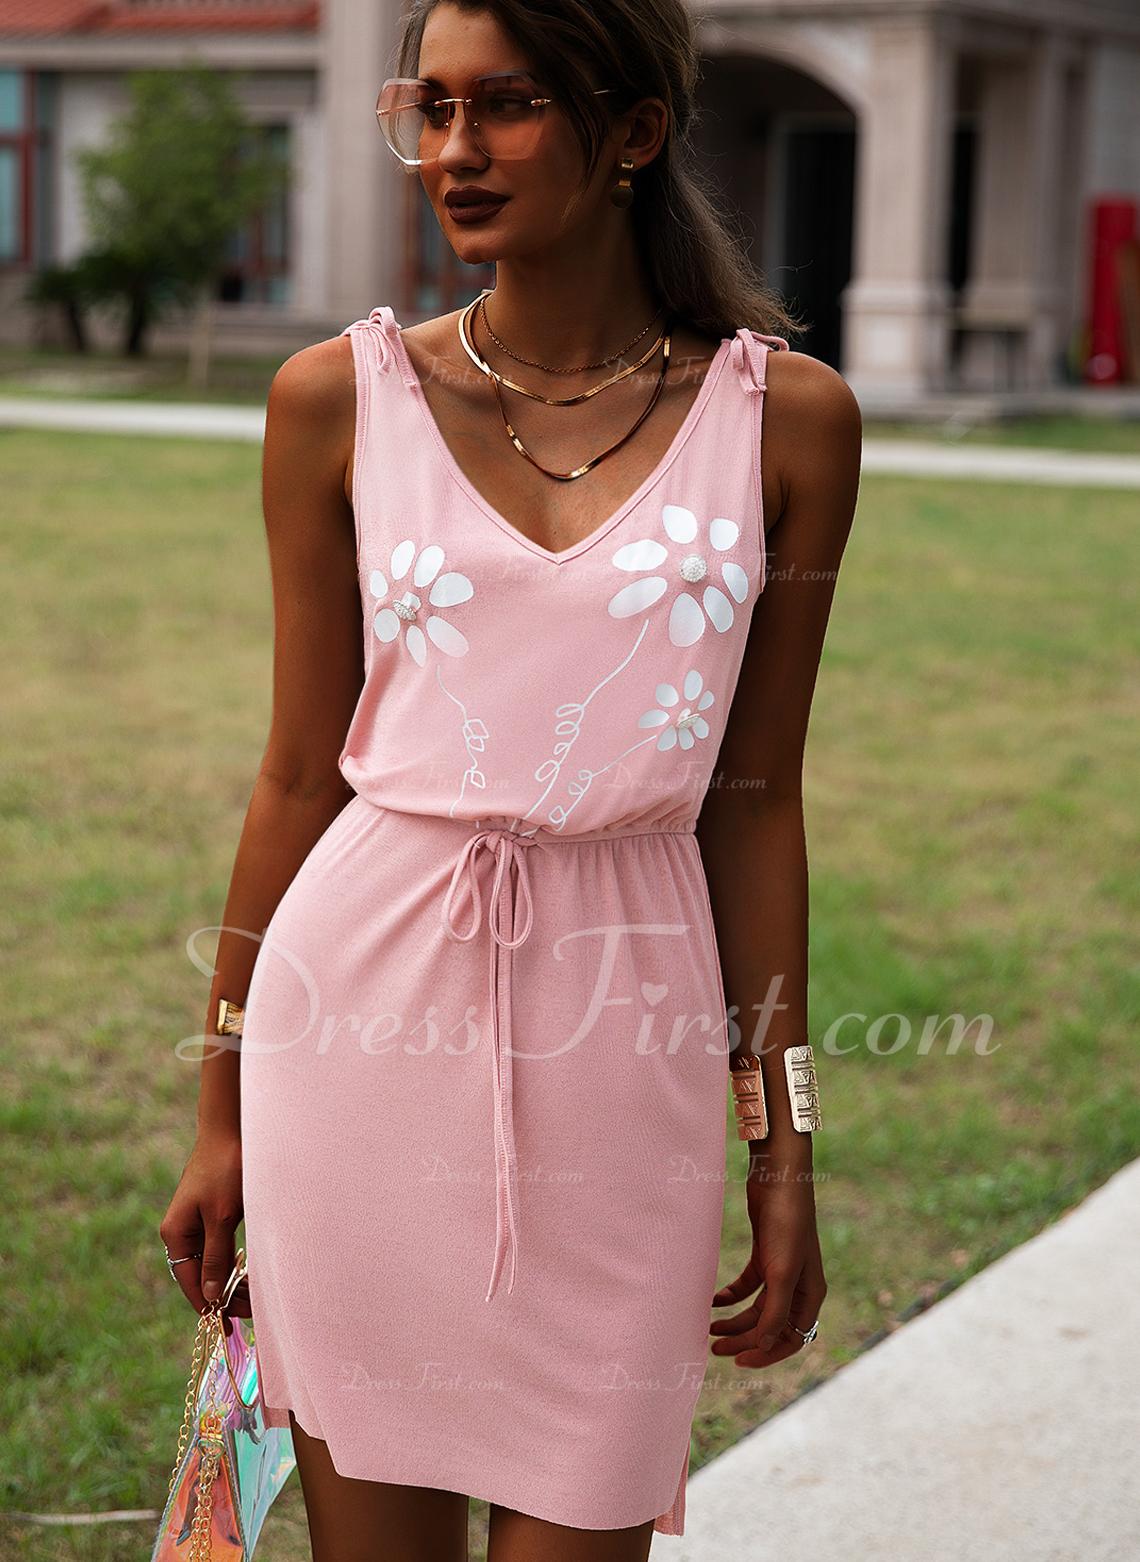 Floral Print Sheath Sleeveless Mini Casual Dresses